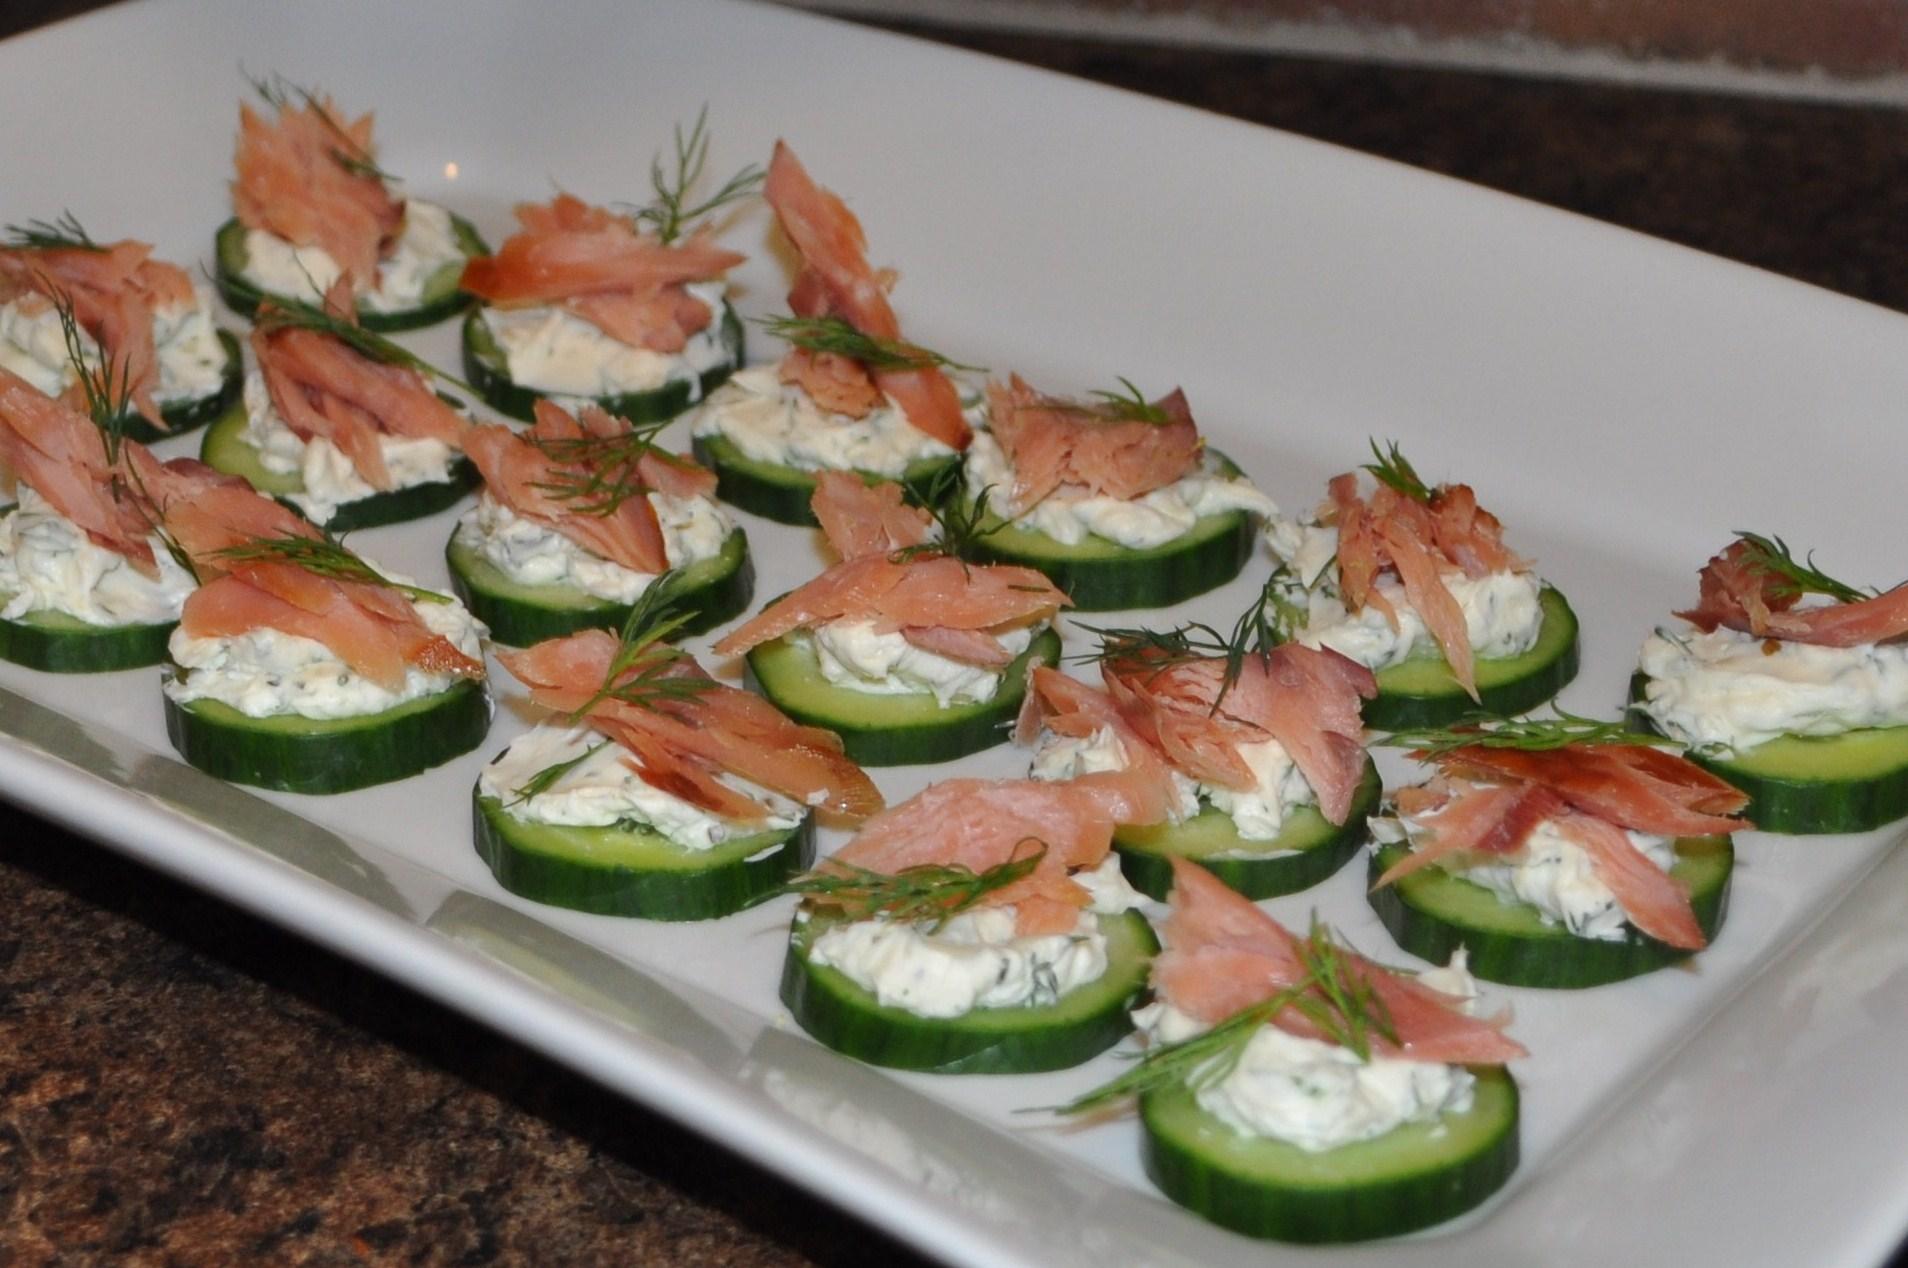 Picture of Cucumber, Cream Cheese & Smoked Salmon/Steelhead